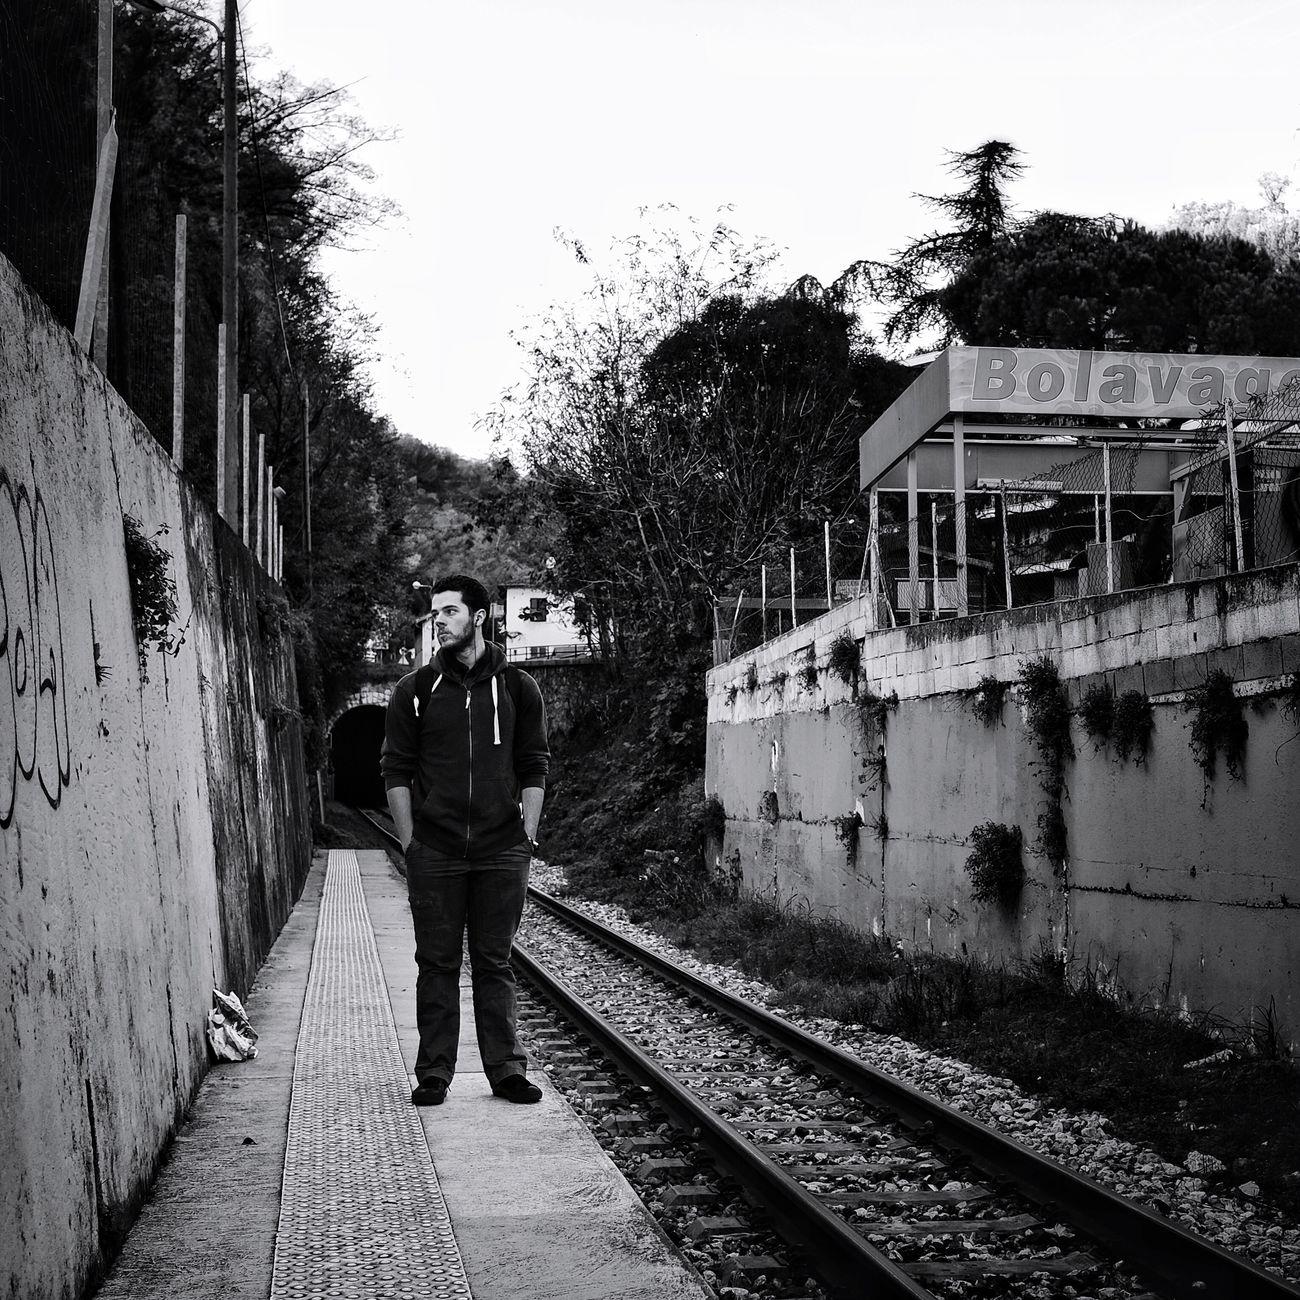 Streetphotography Streetphoto_bw Street Photography Train Station Train Blackandwhite Black And White Blackandwhite Photography Black & White Man Candid Photography Candid Portraits Borderline